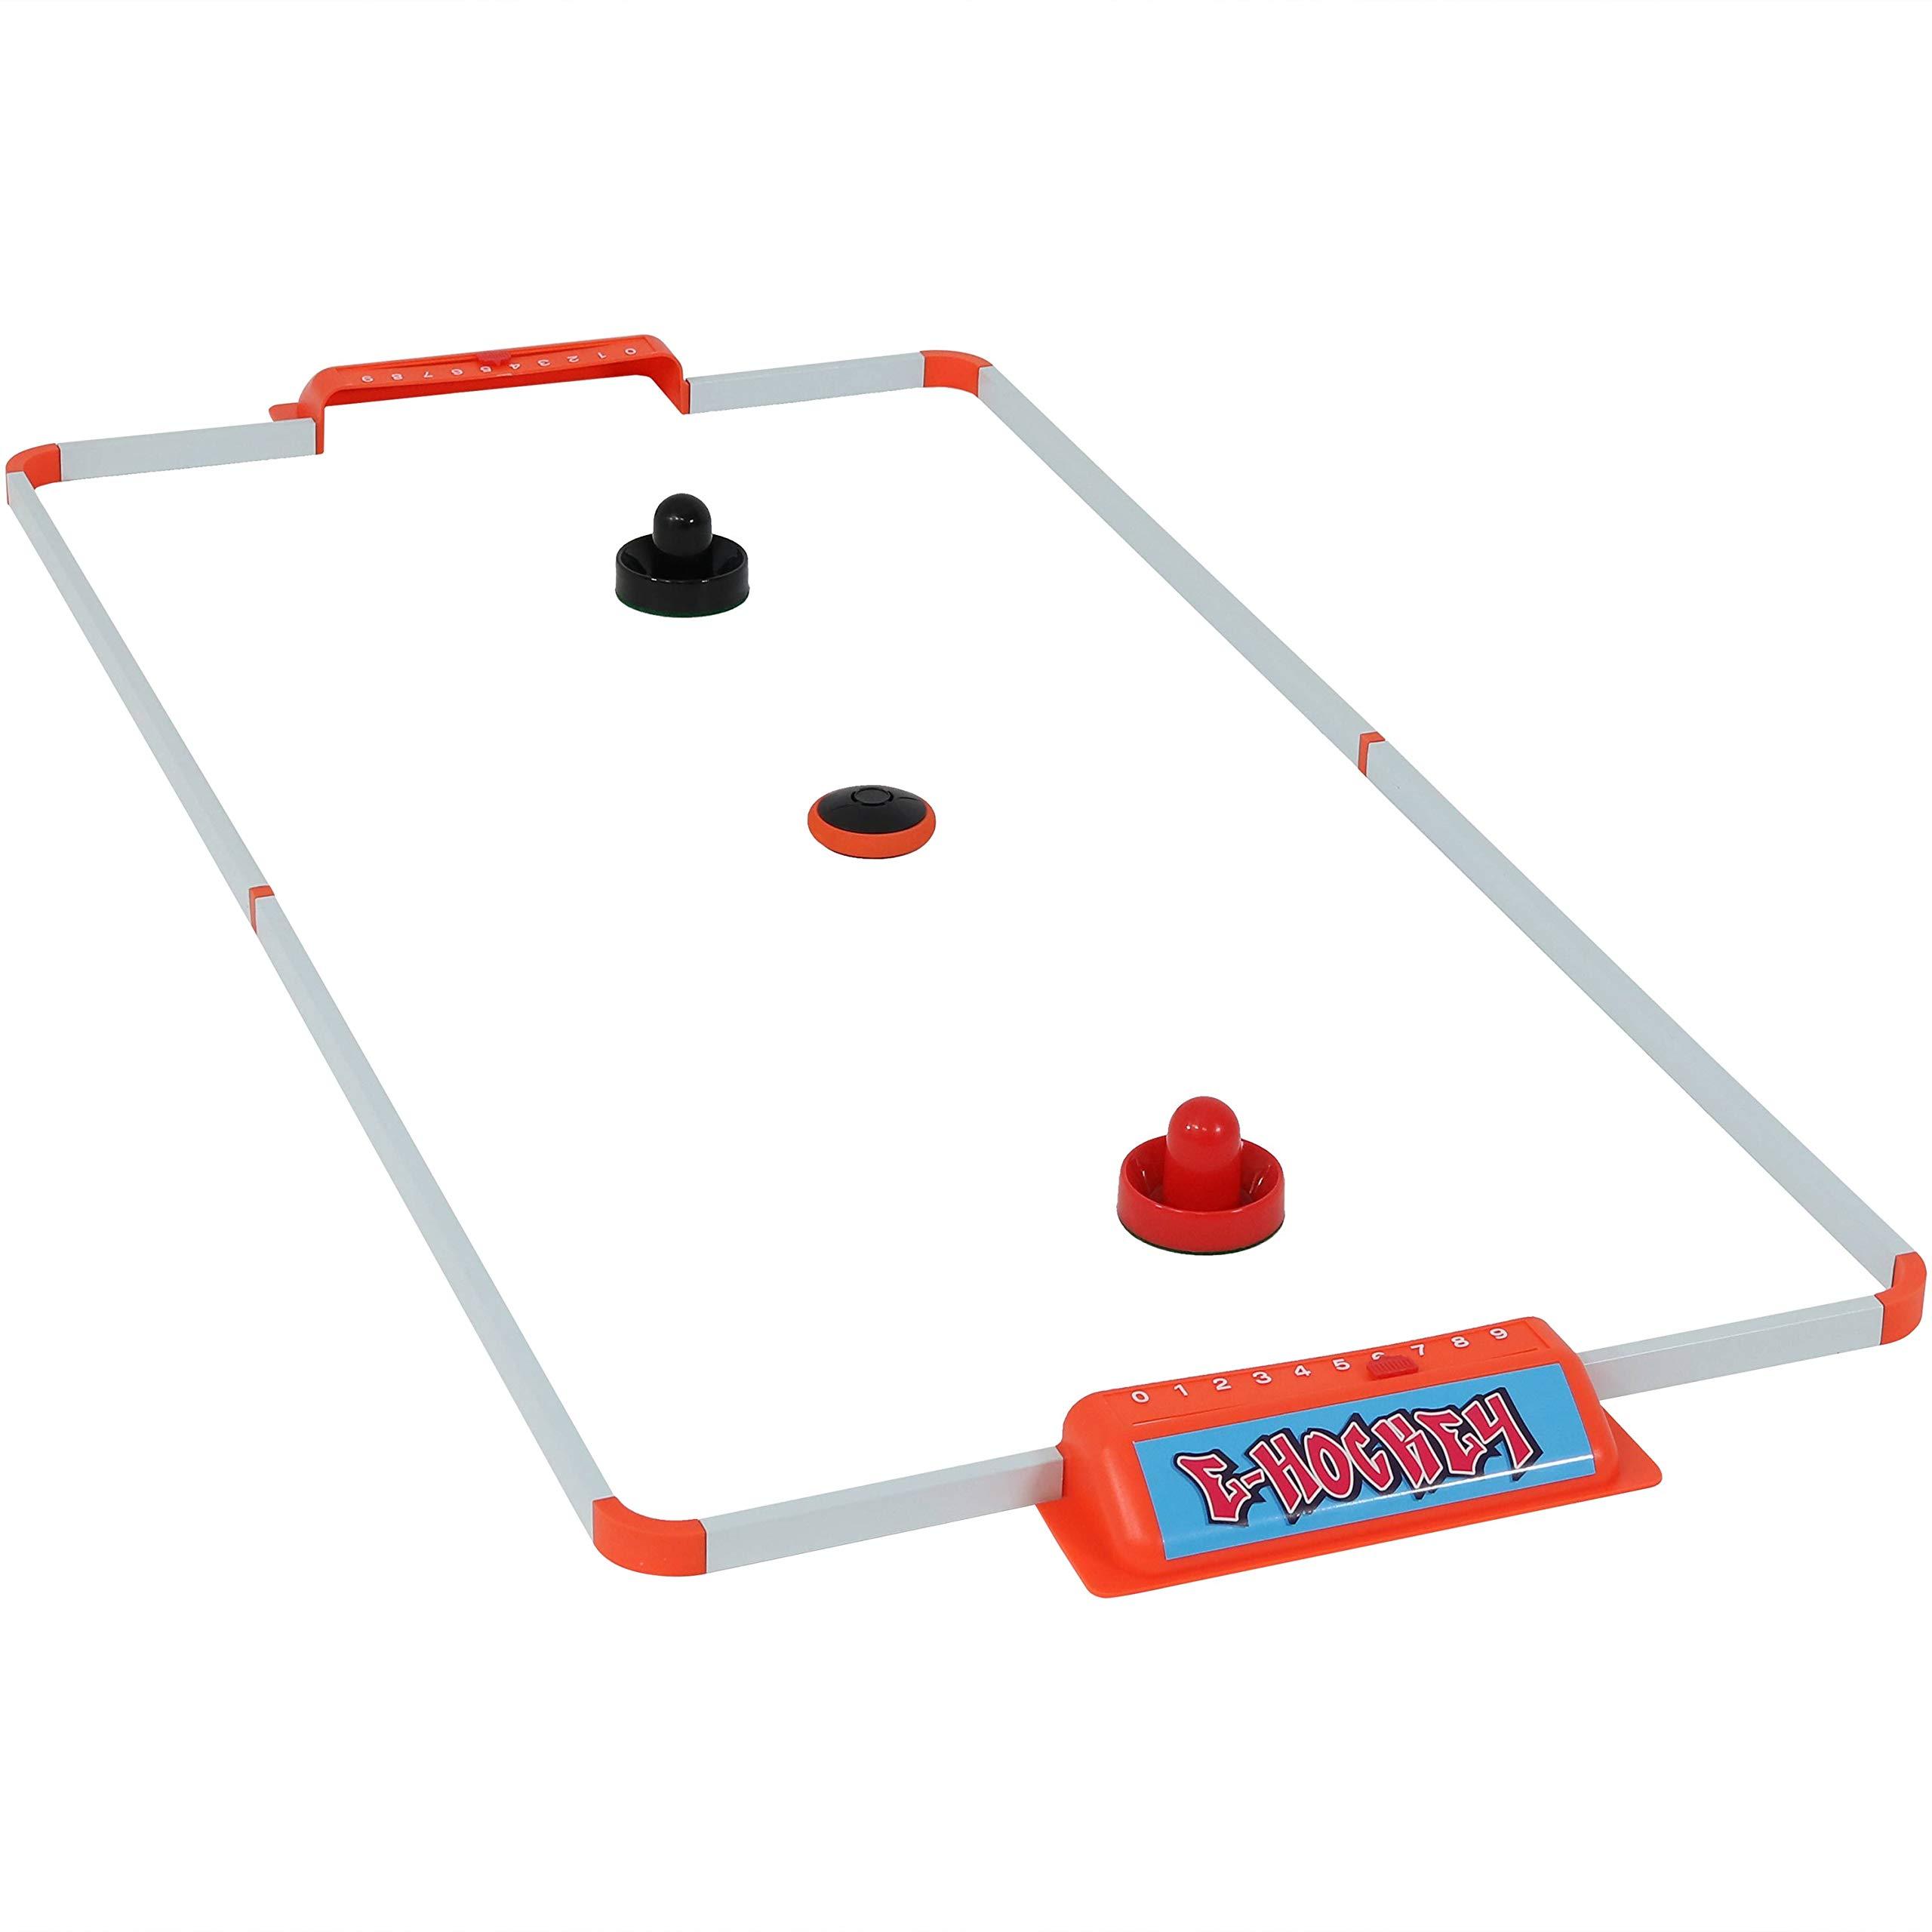 Sunnydaze Portable Hover Air Hockey Set, 52-Inch by Sunnydaze Decor